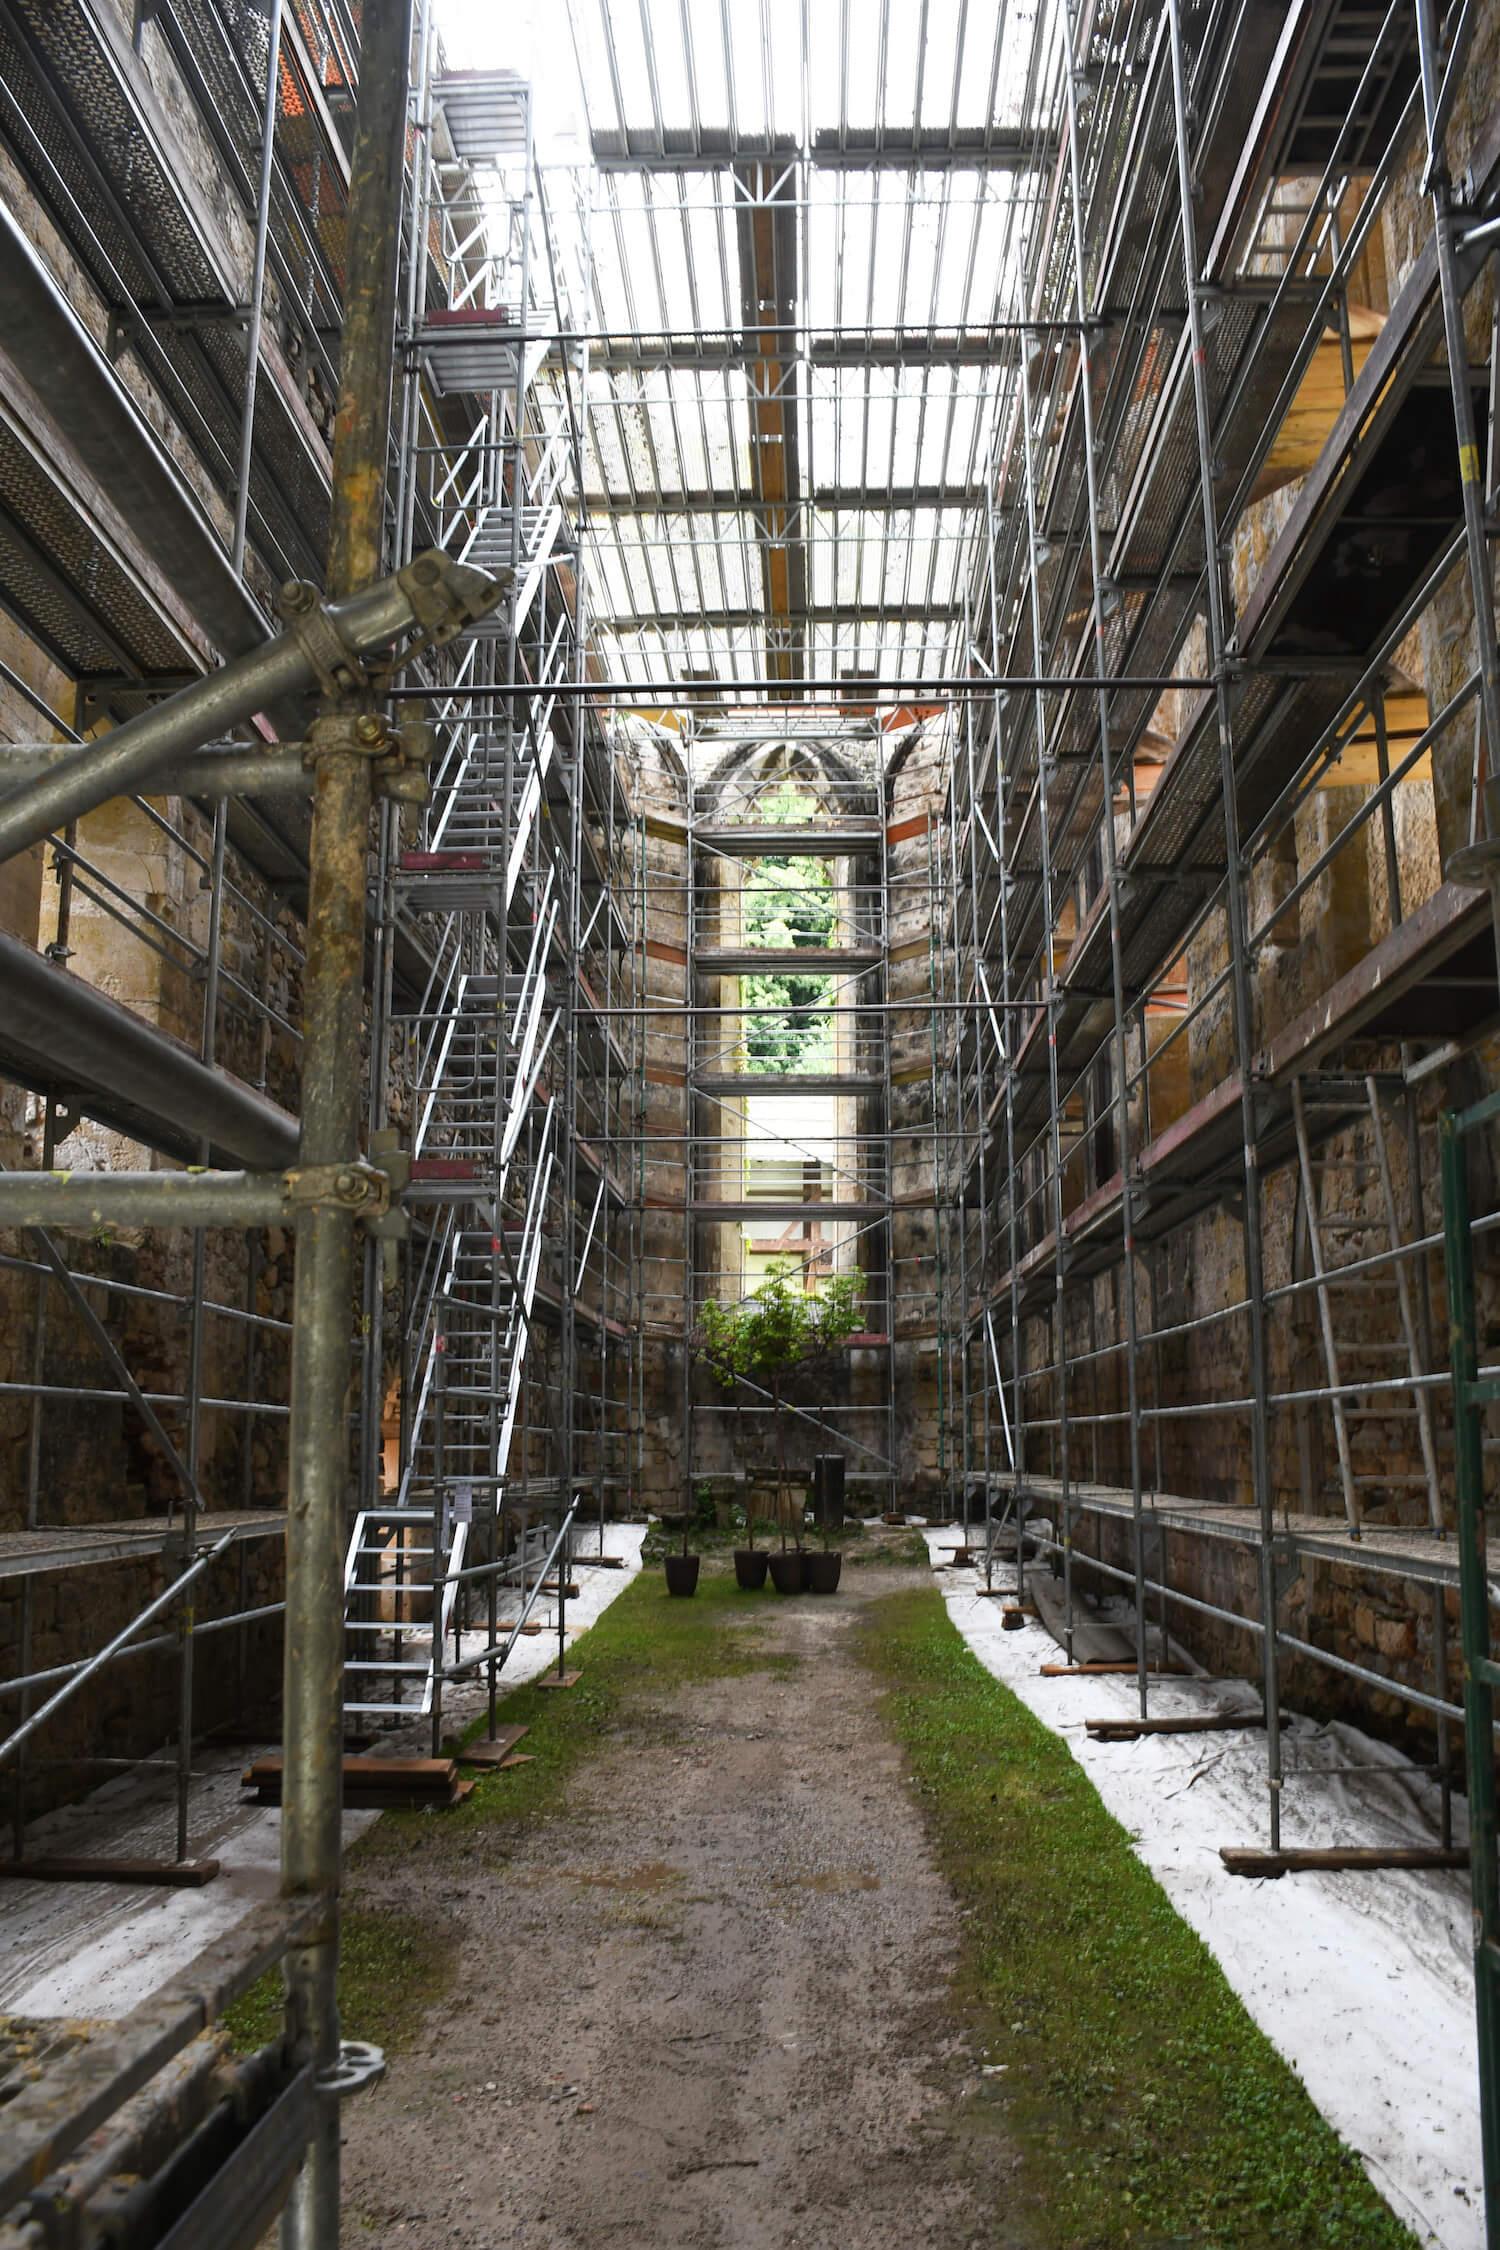 Gradbeni odri notranjost pogled proti prezbiteriju